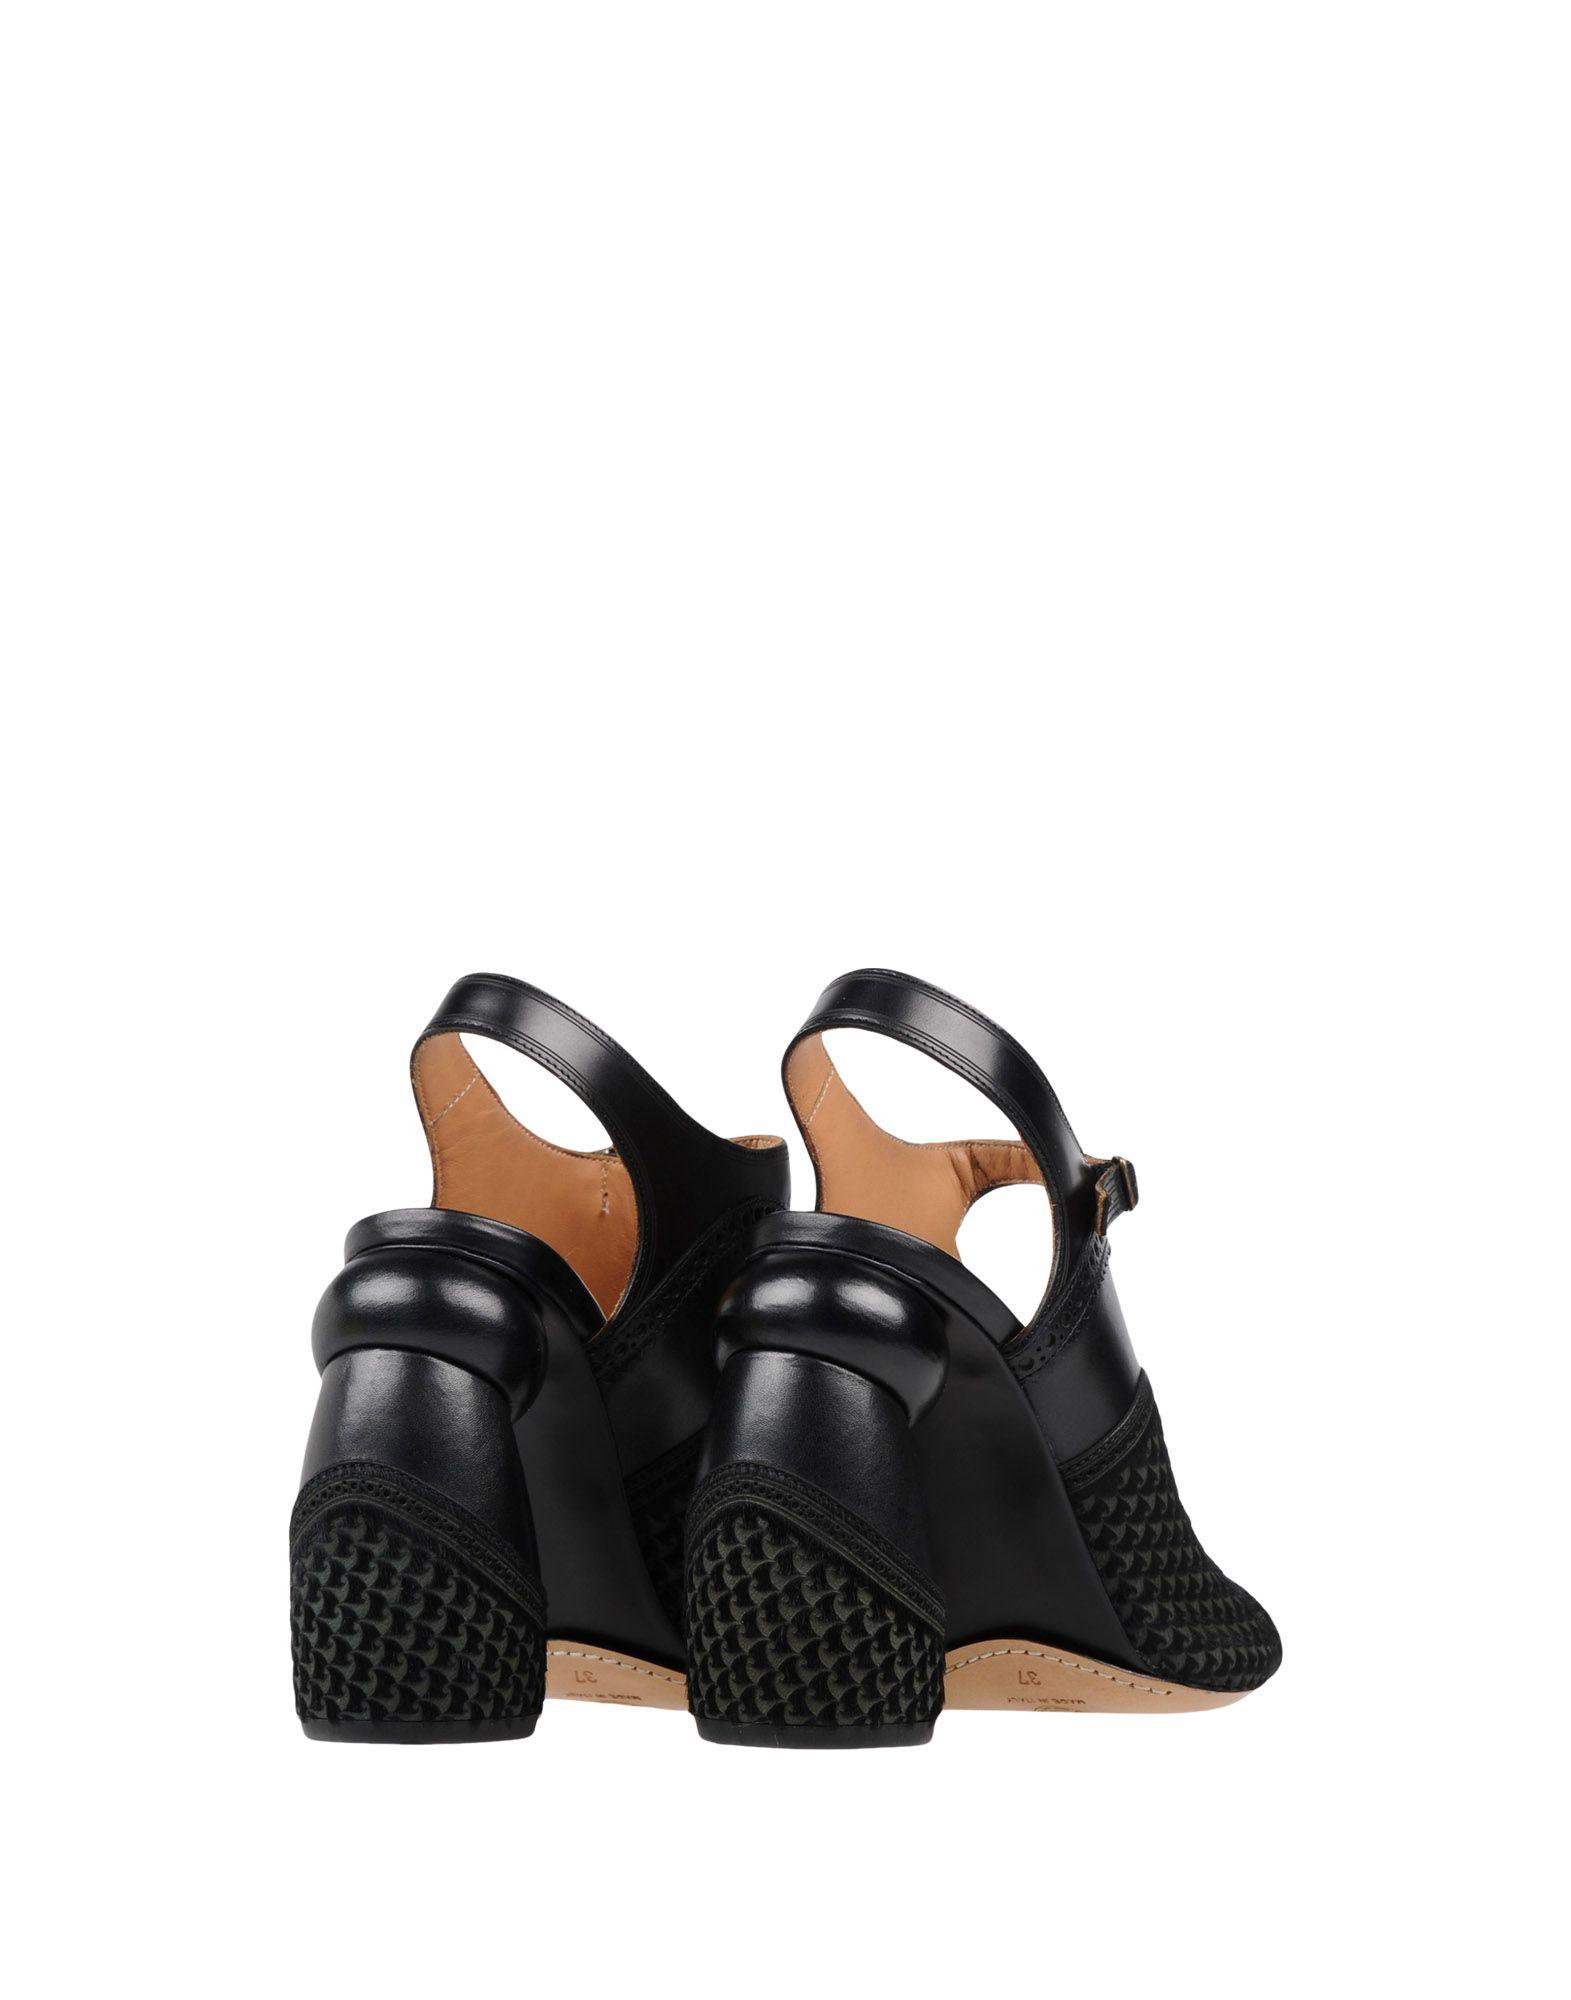 Dries Van Noten Sandalen aussehende Damen  11462333XRGünstige gut aussehende Sandalen Schuhe a18d11